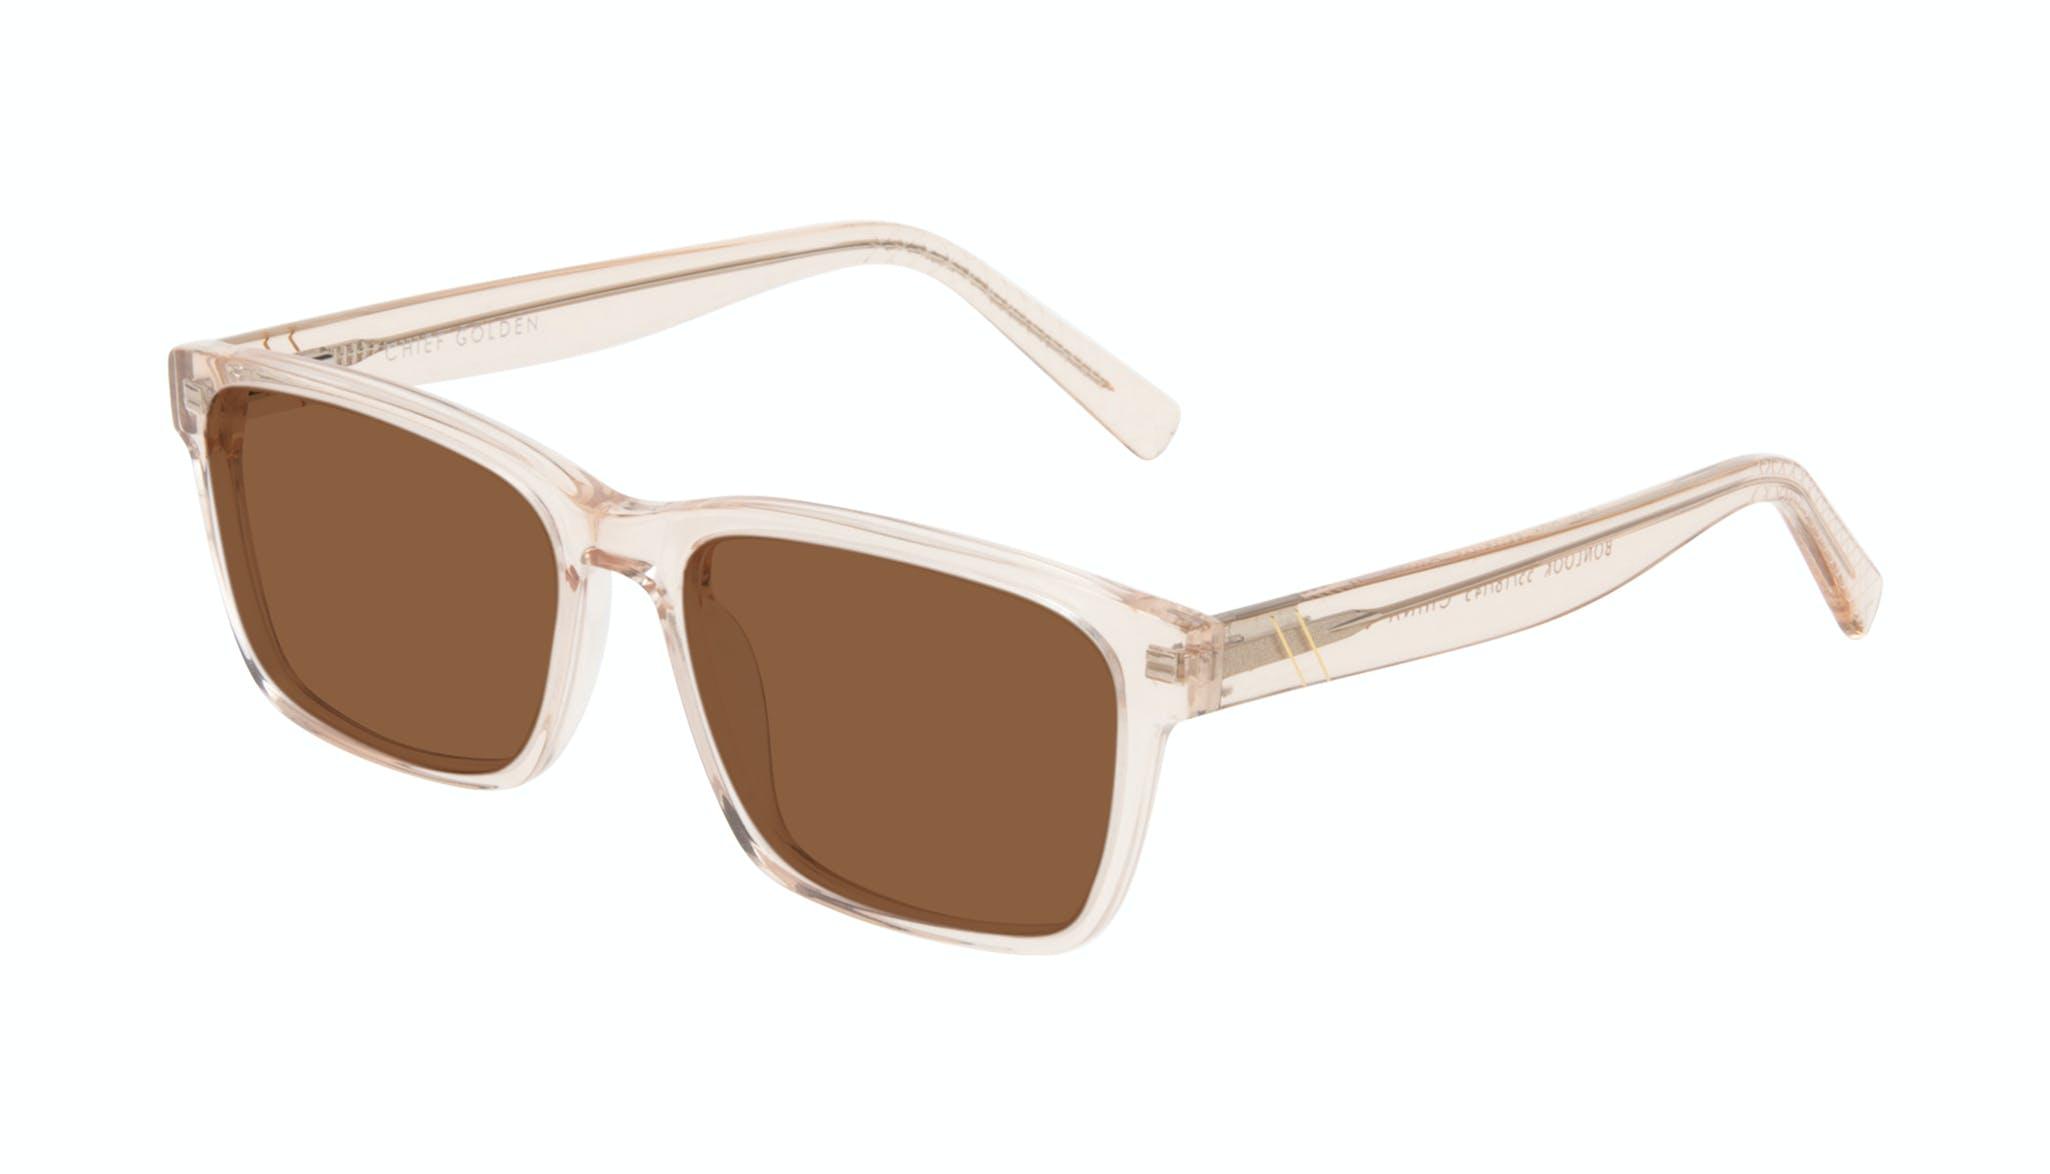 Affordable Fashion Glasses Square Sunglasses Men Chief Golden Tilt